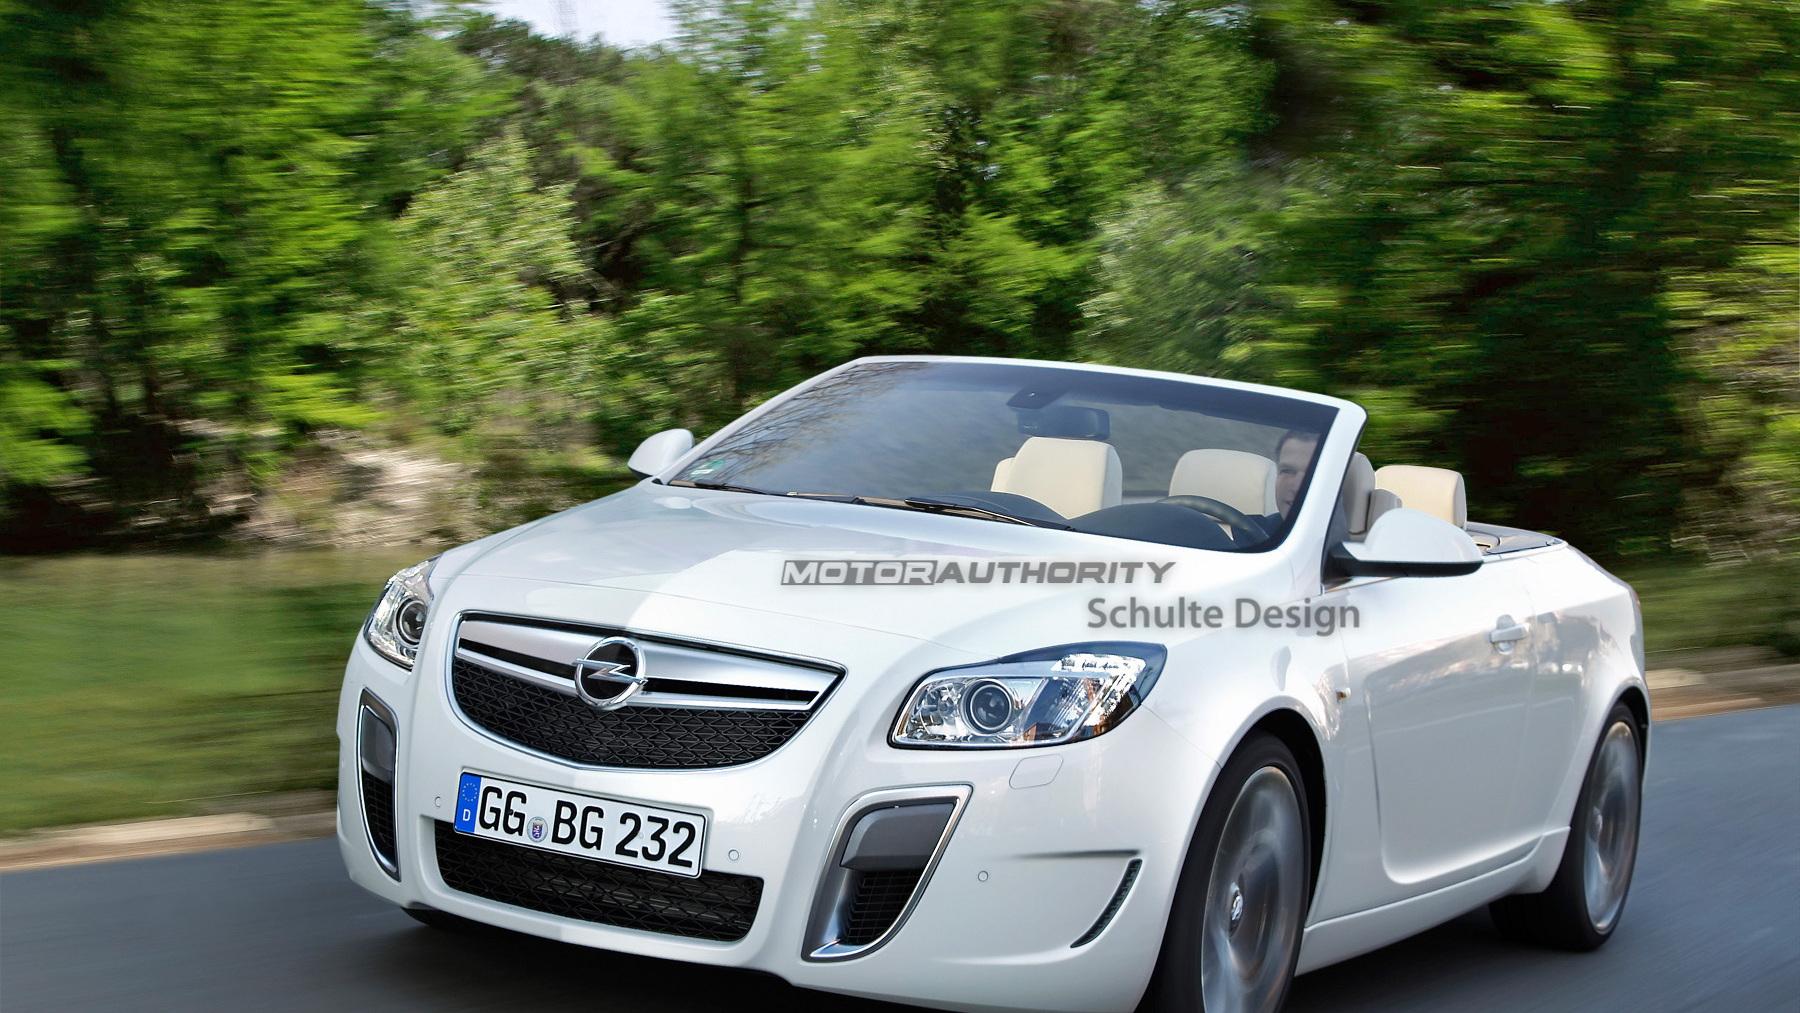 Buick Regal/Opel Insignia convertible preview rendering